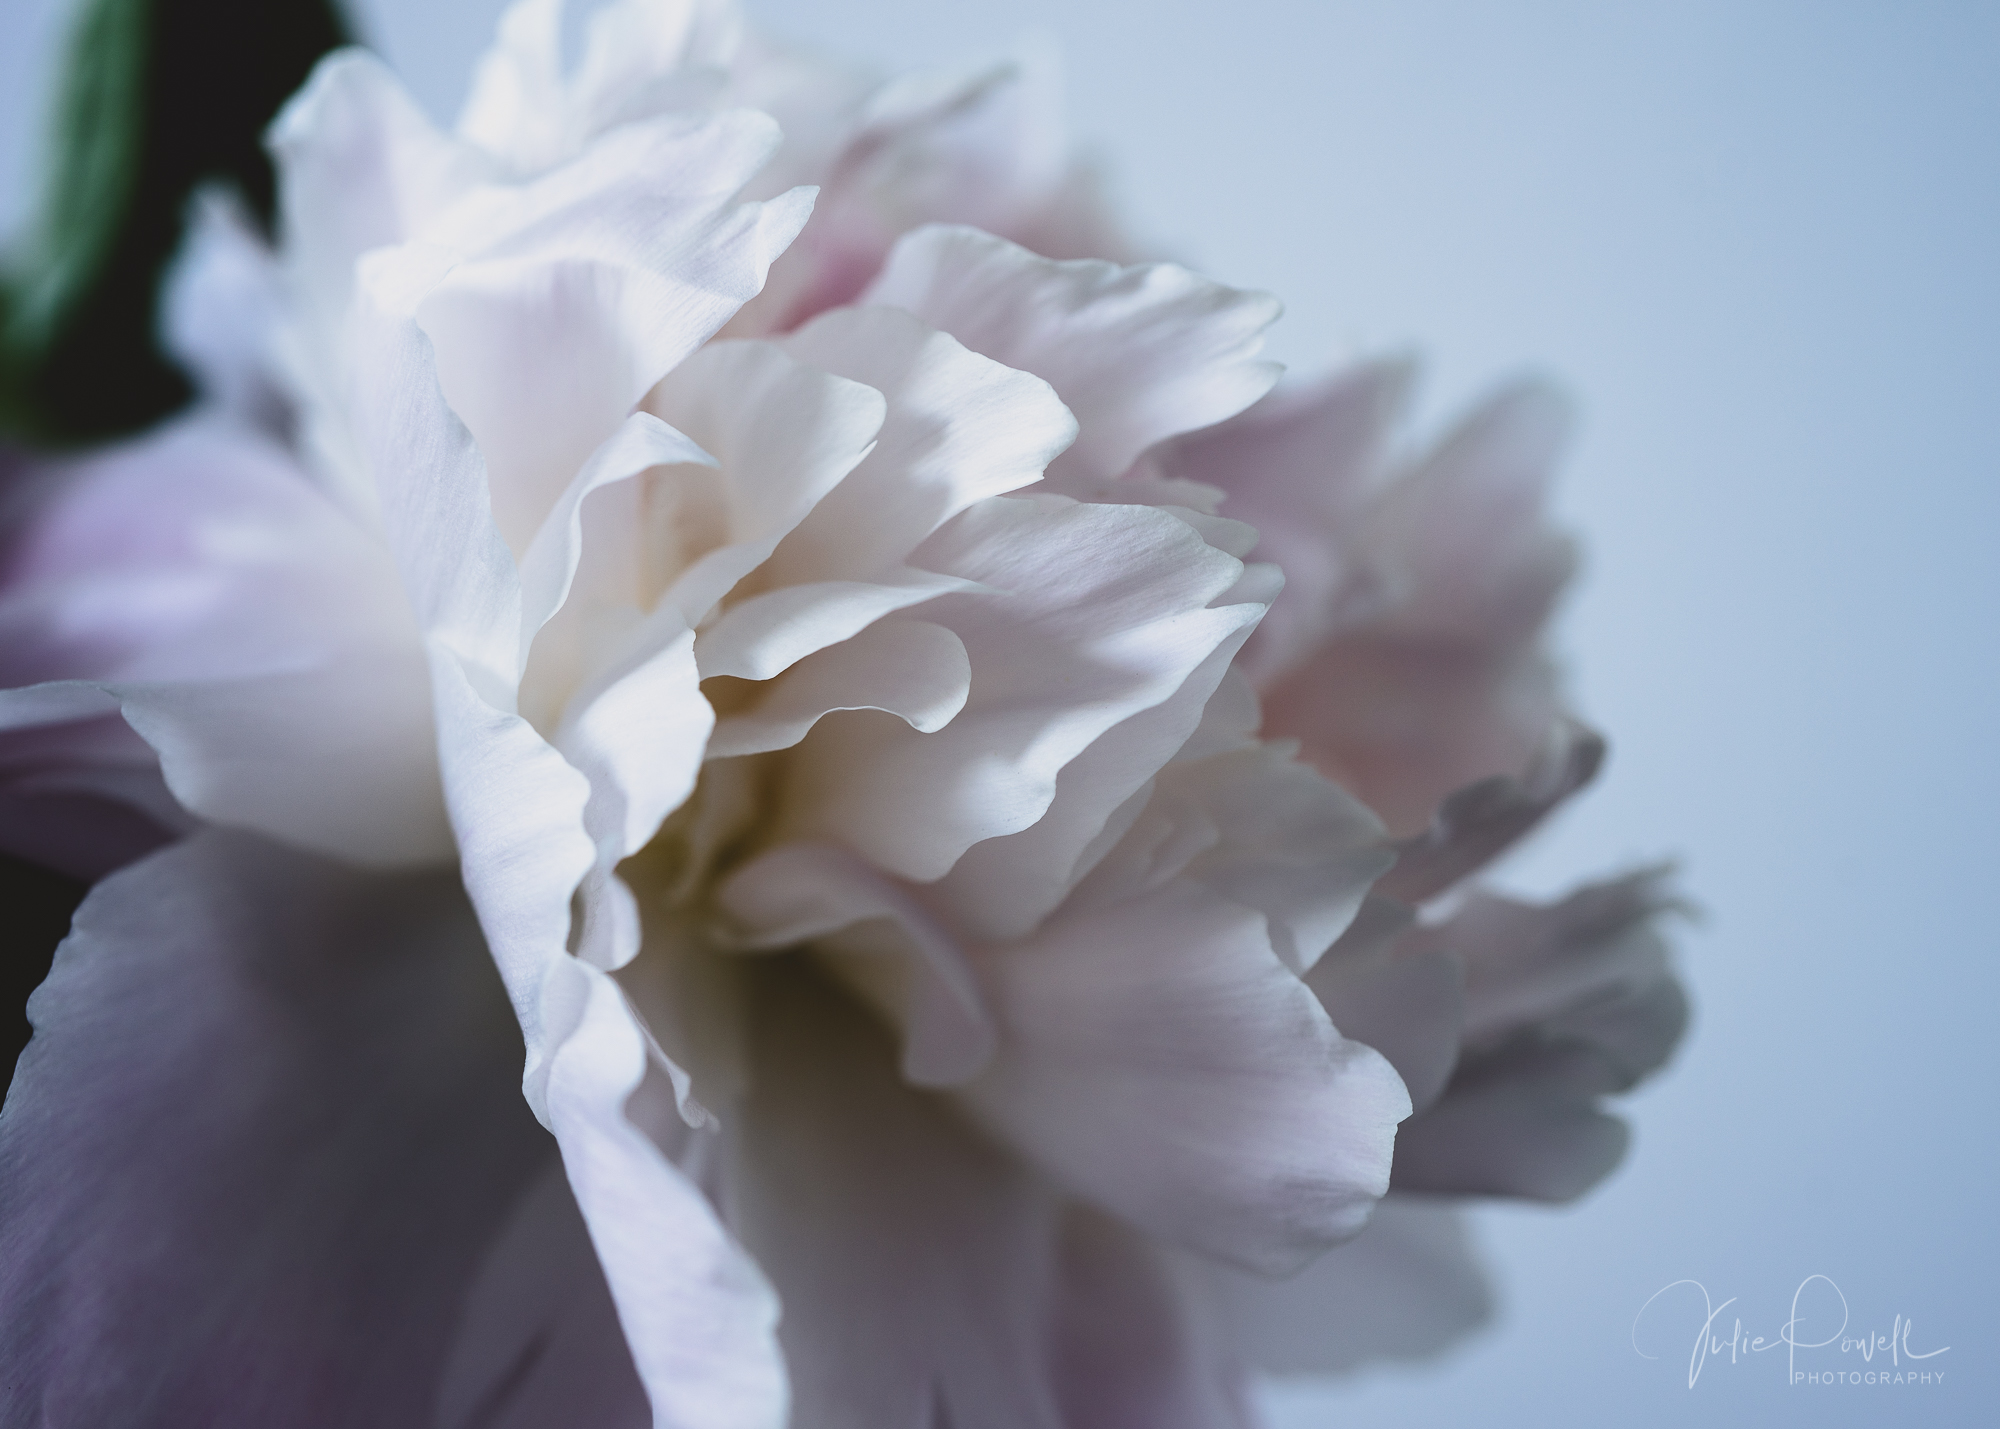 Julie Powell_Peony-10.jpg